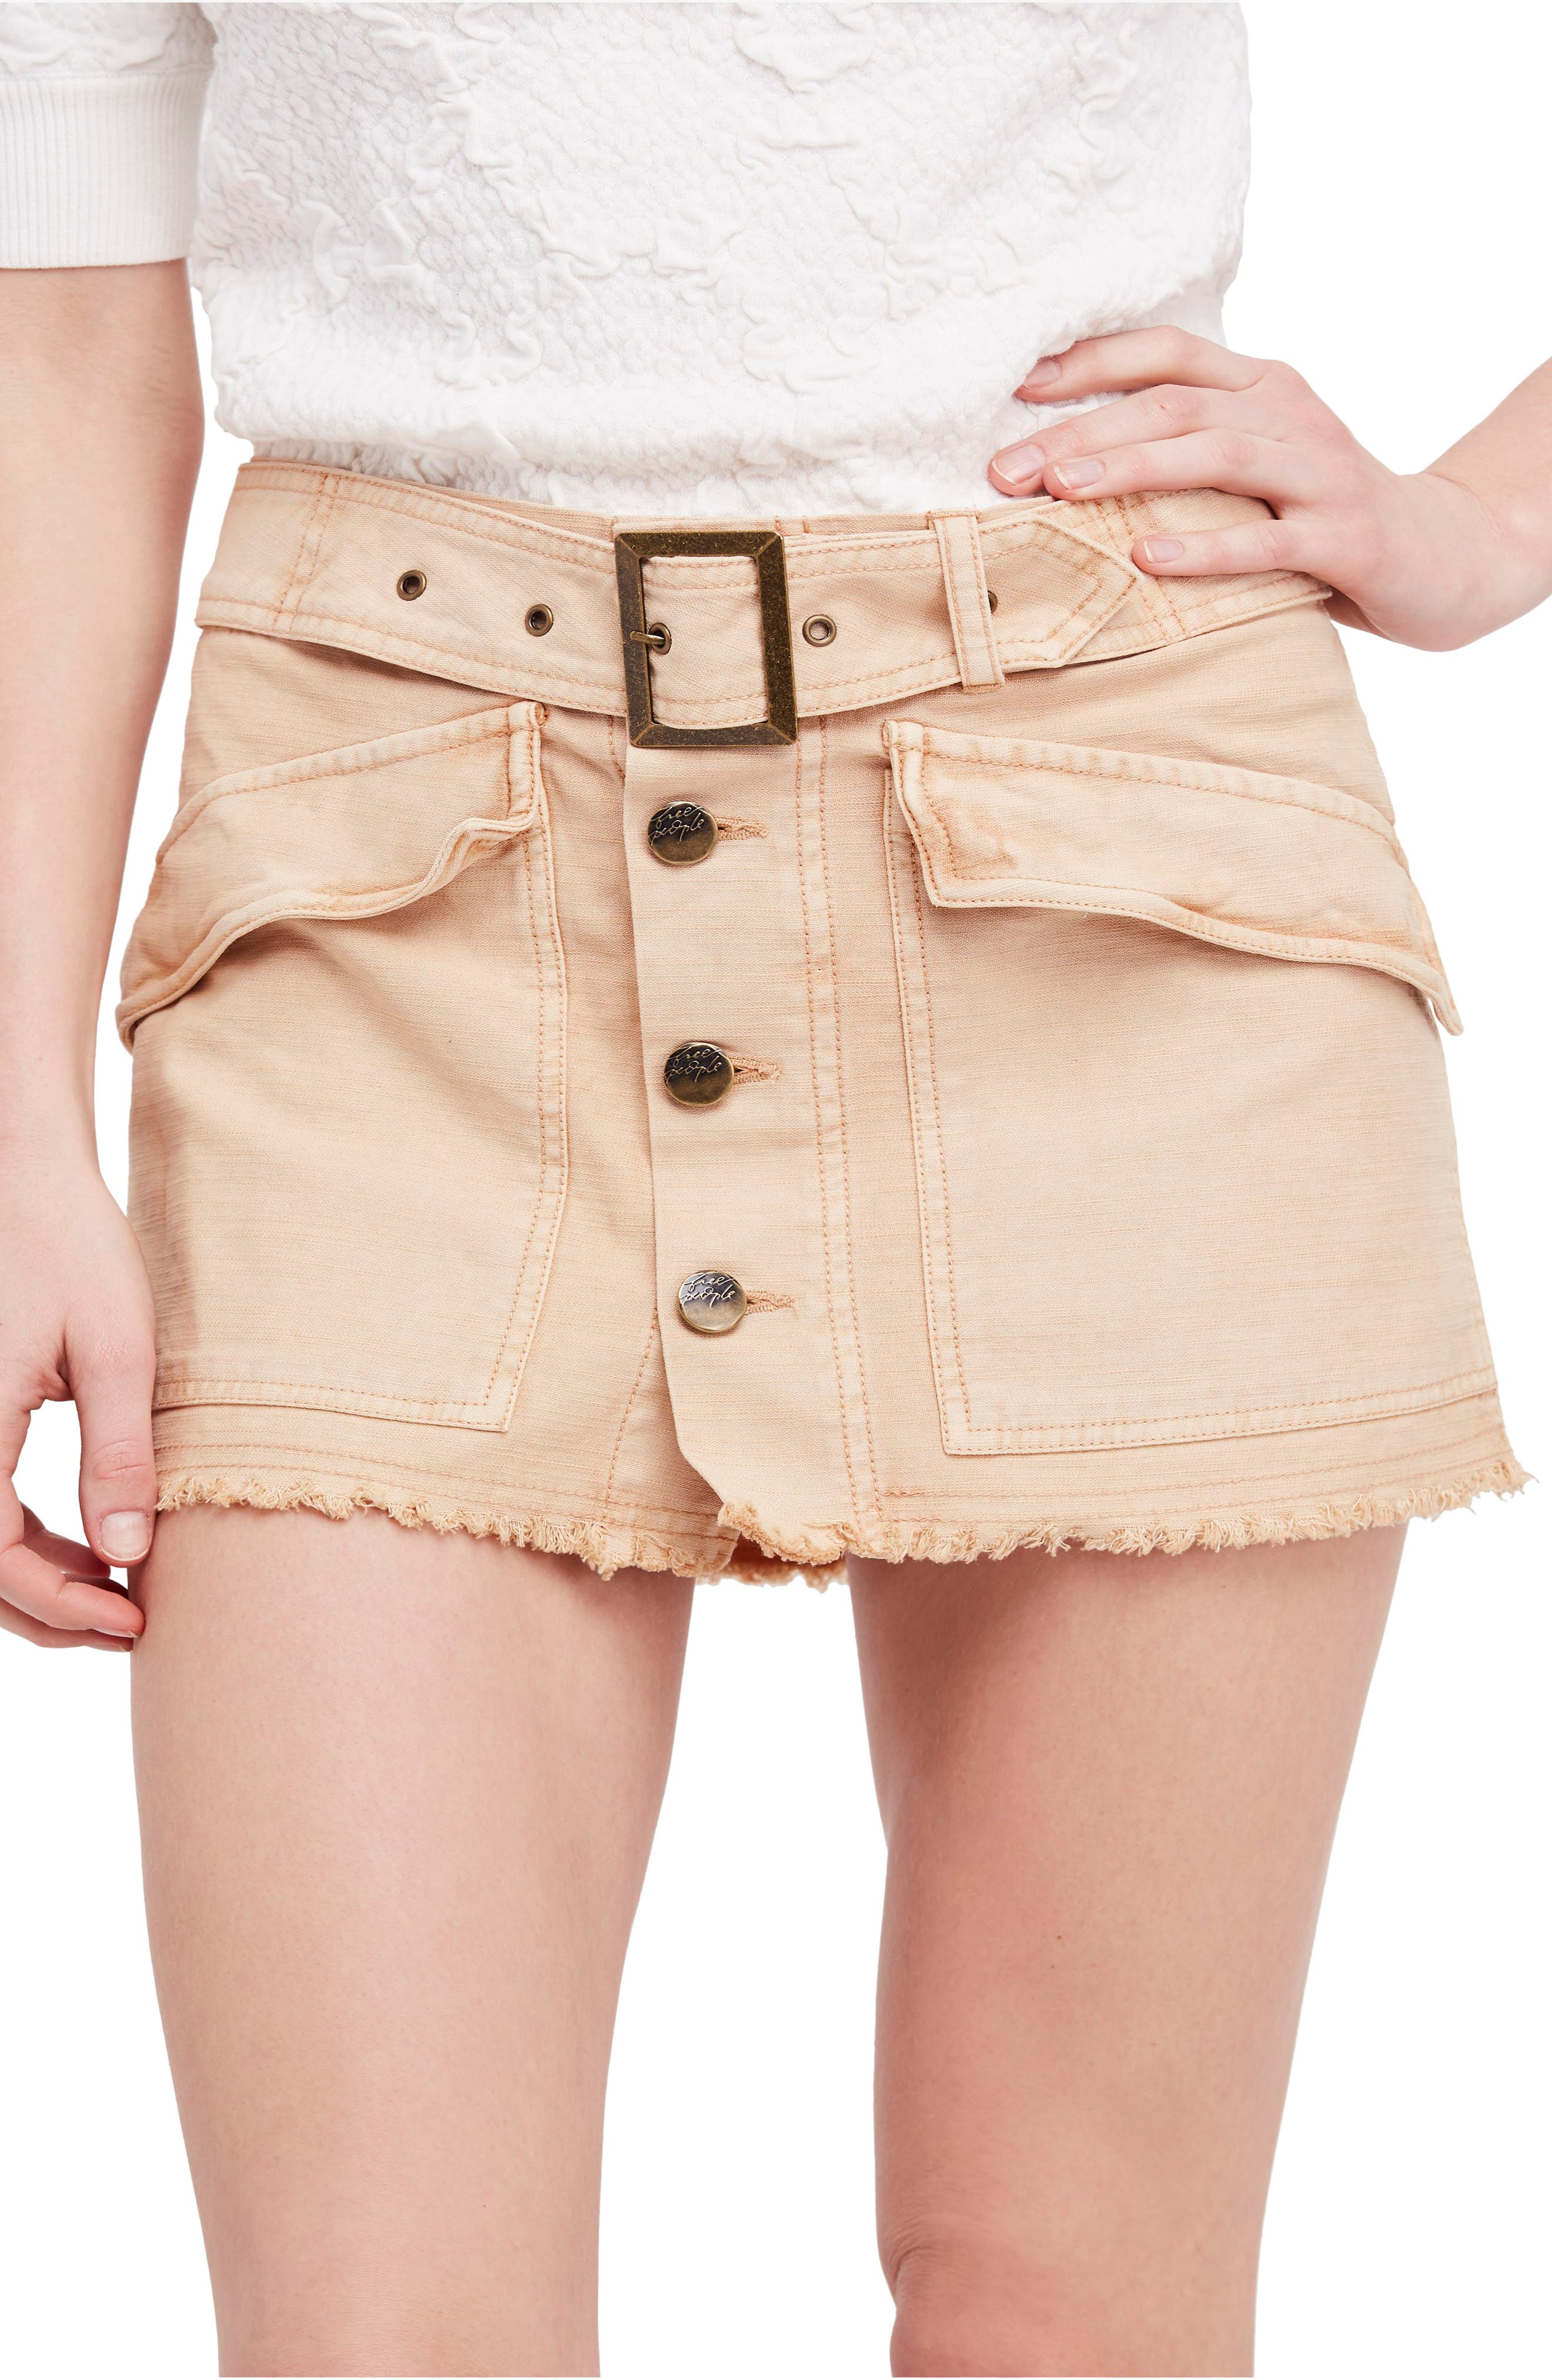 Hangin' On Tight Miniskirt,                         Main,                         color, Nude